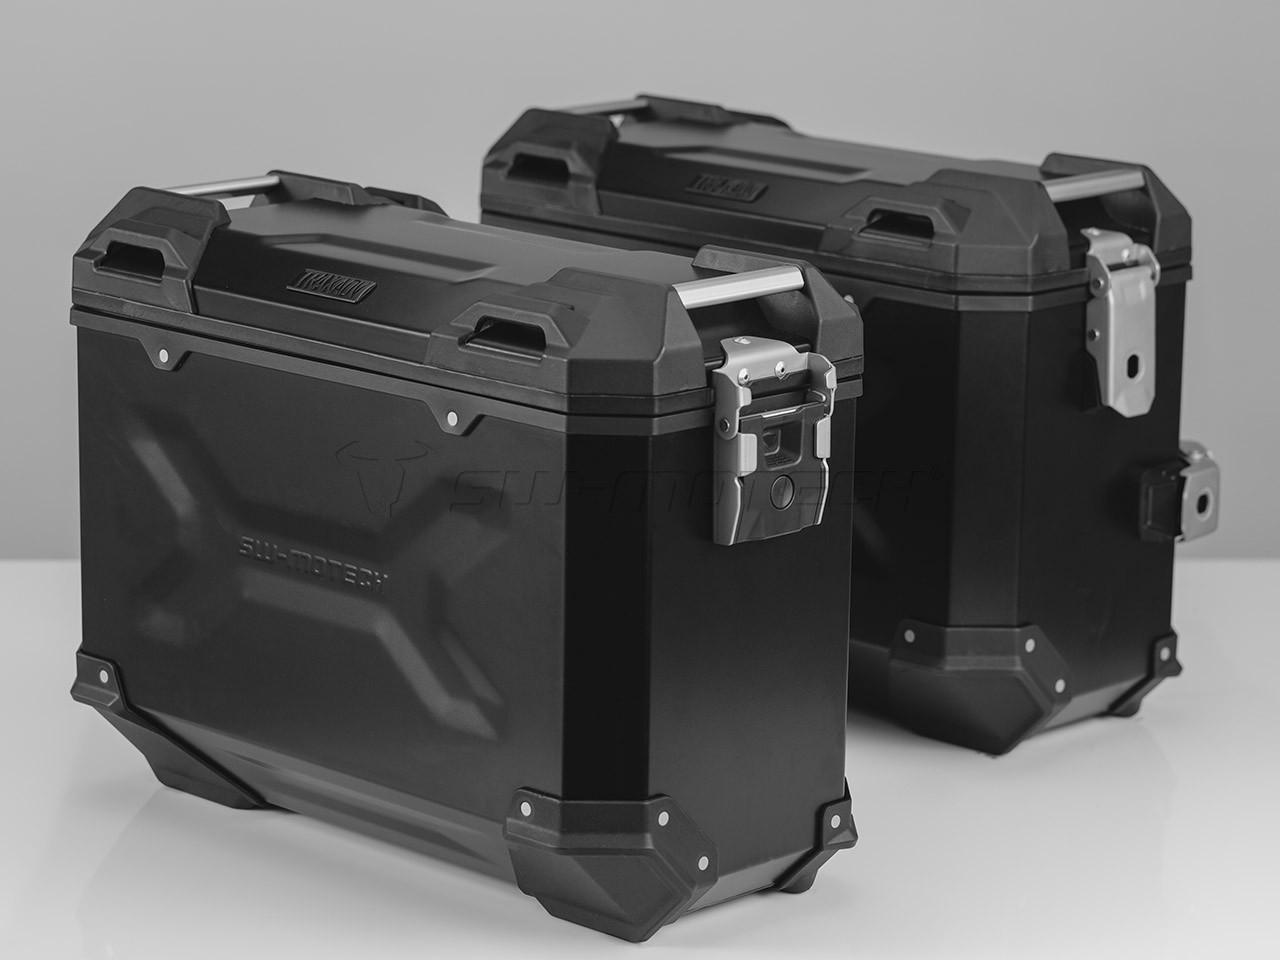 Honda CB 500 F (16-) - sada bočních kufrů TRAX Adventure 37 l. s